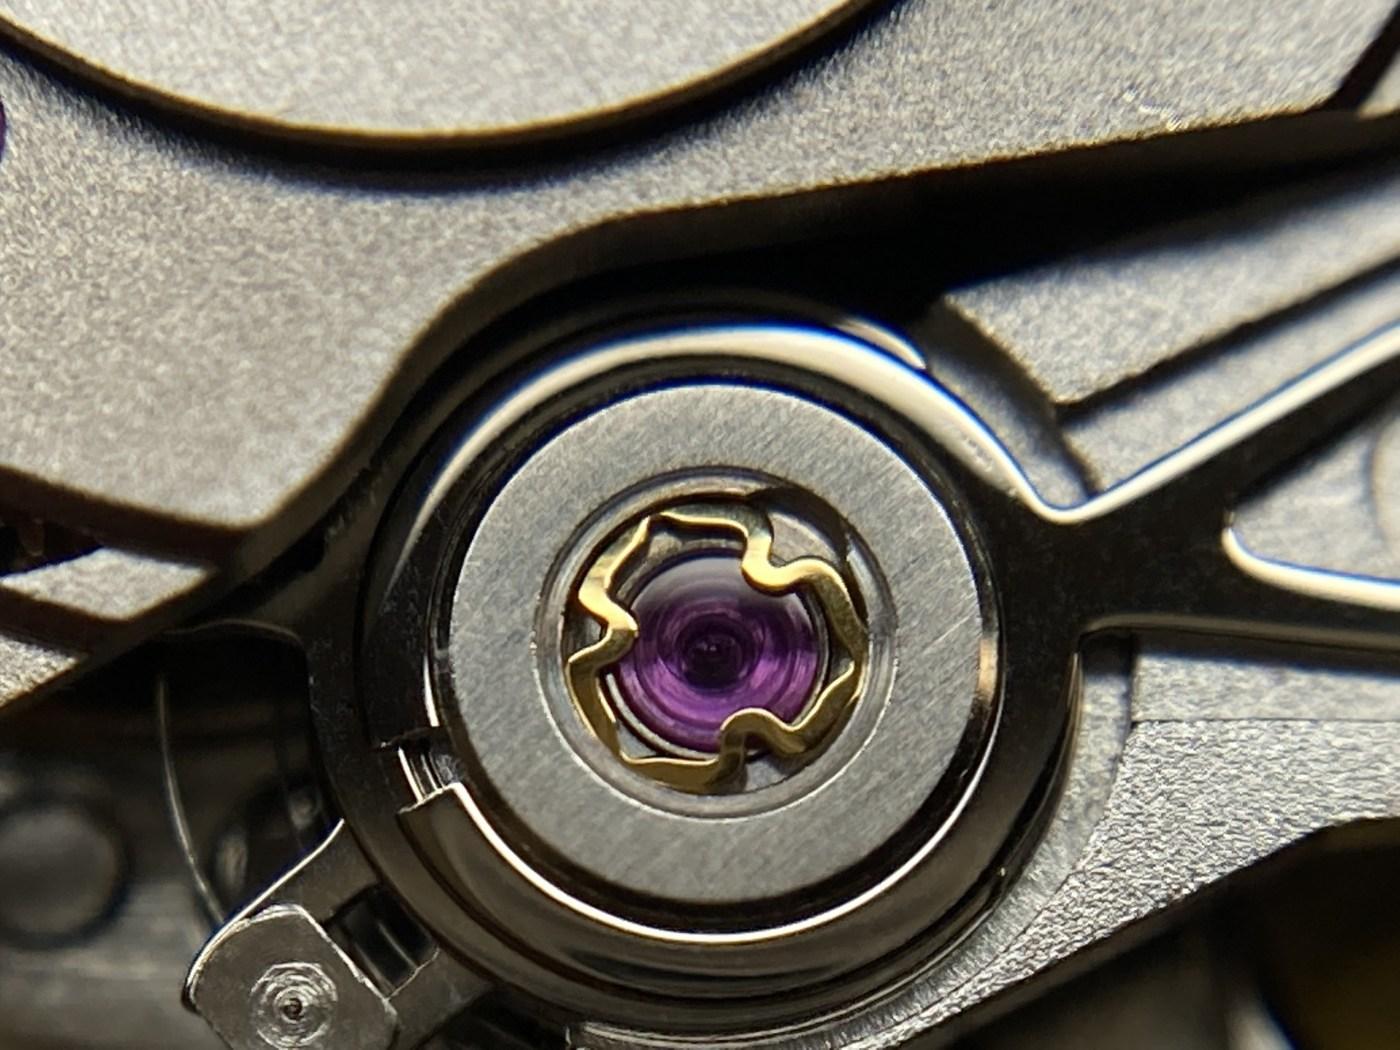 Balance jewels from a Swiss Tech Caliber S24